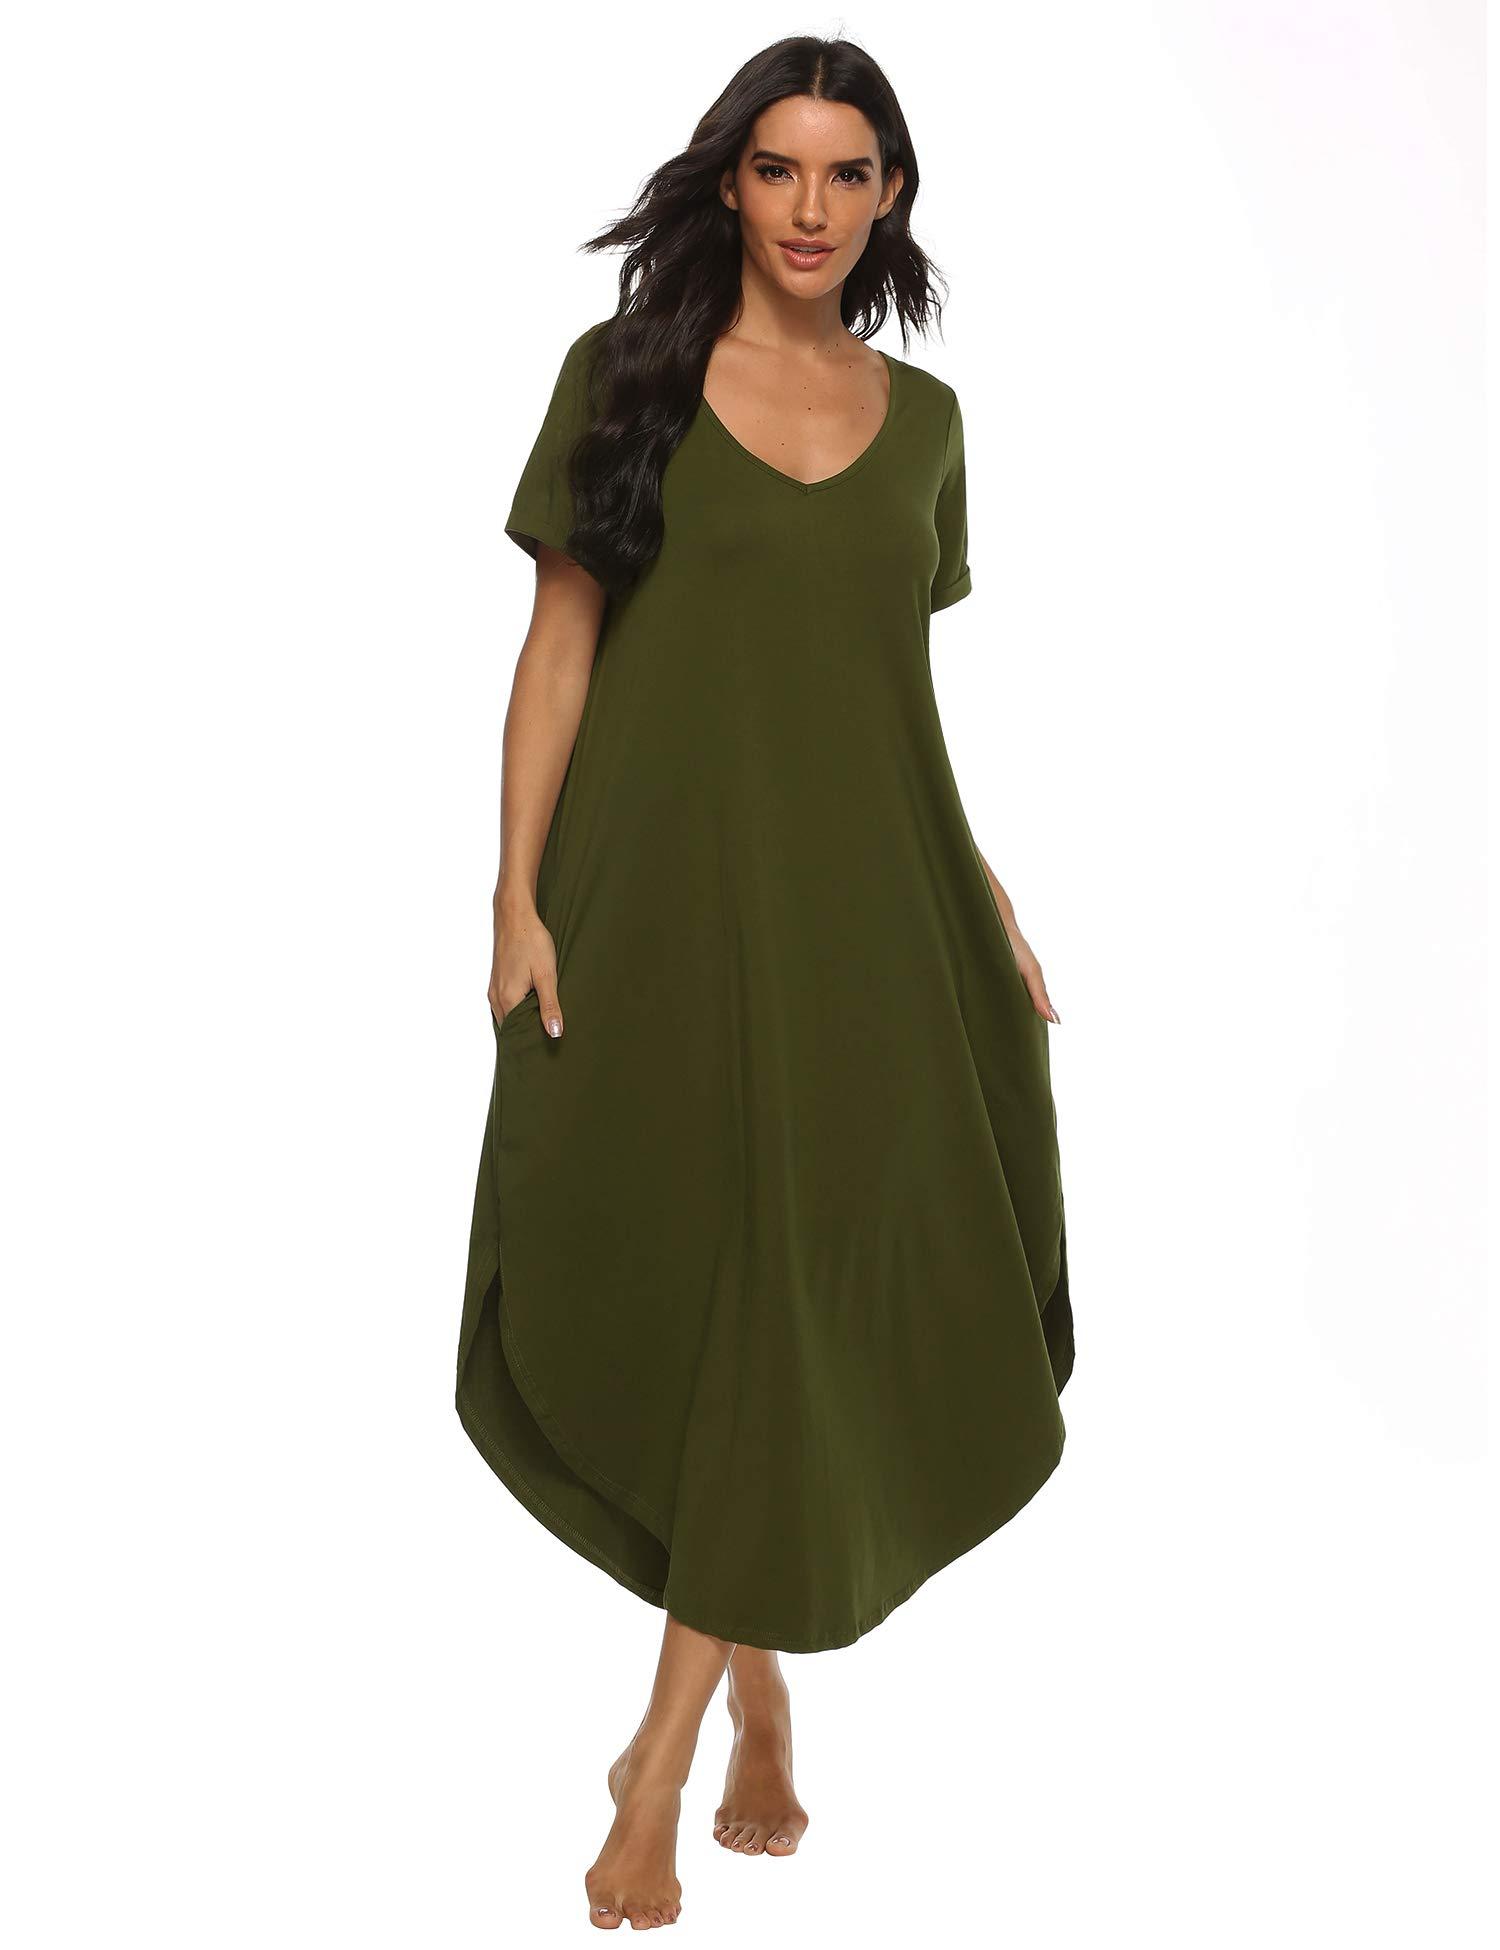 Alletya Women's Casual Night Dress V Neck Long Night Shirt Short Sleeve Nightgown Cotton Sleep Shirt Sleepwear Pajama S-XXL